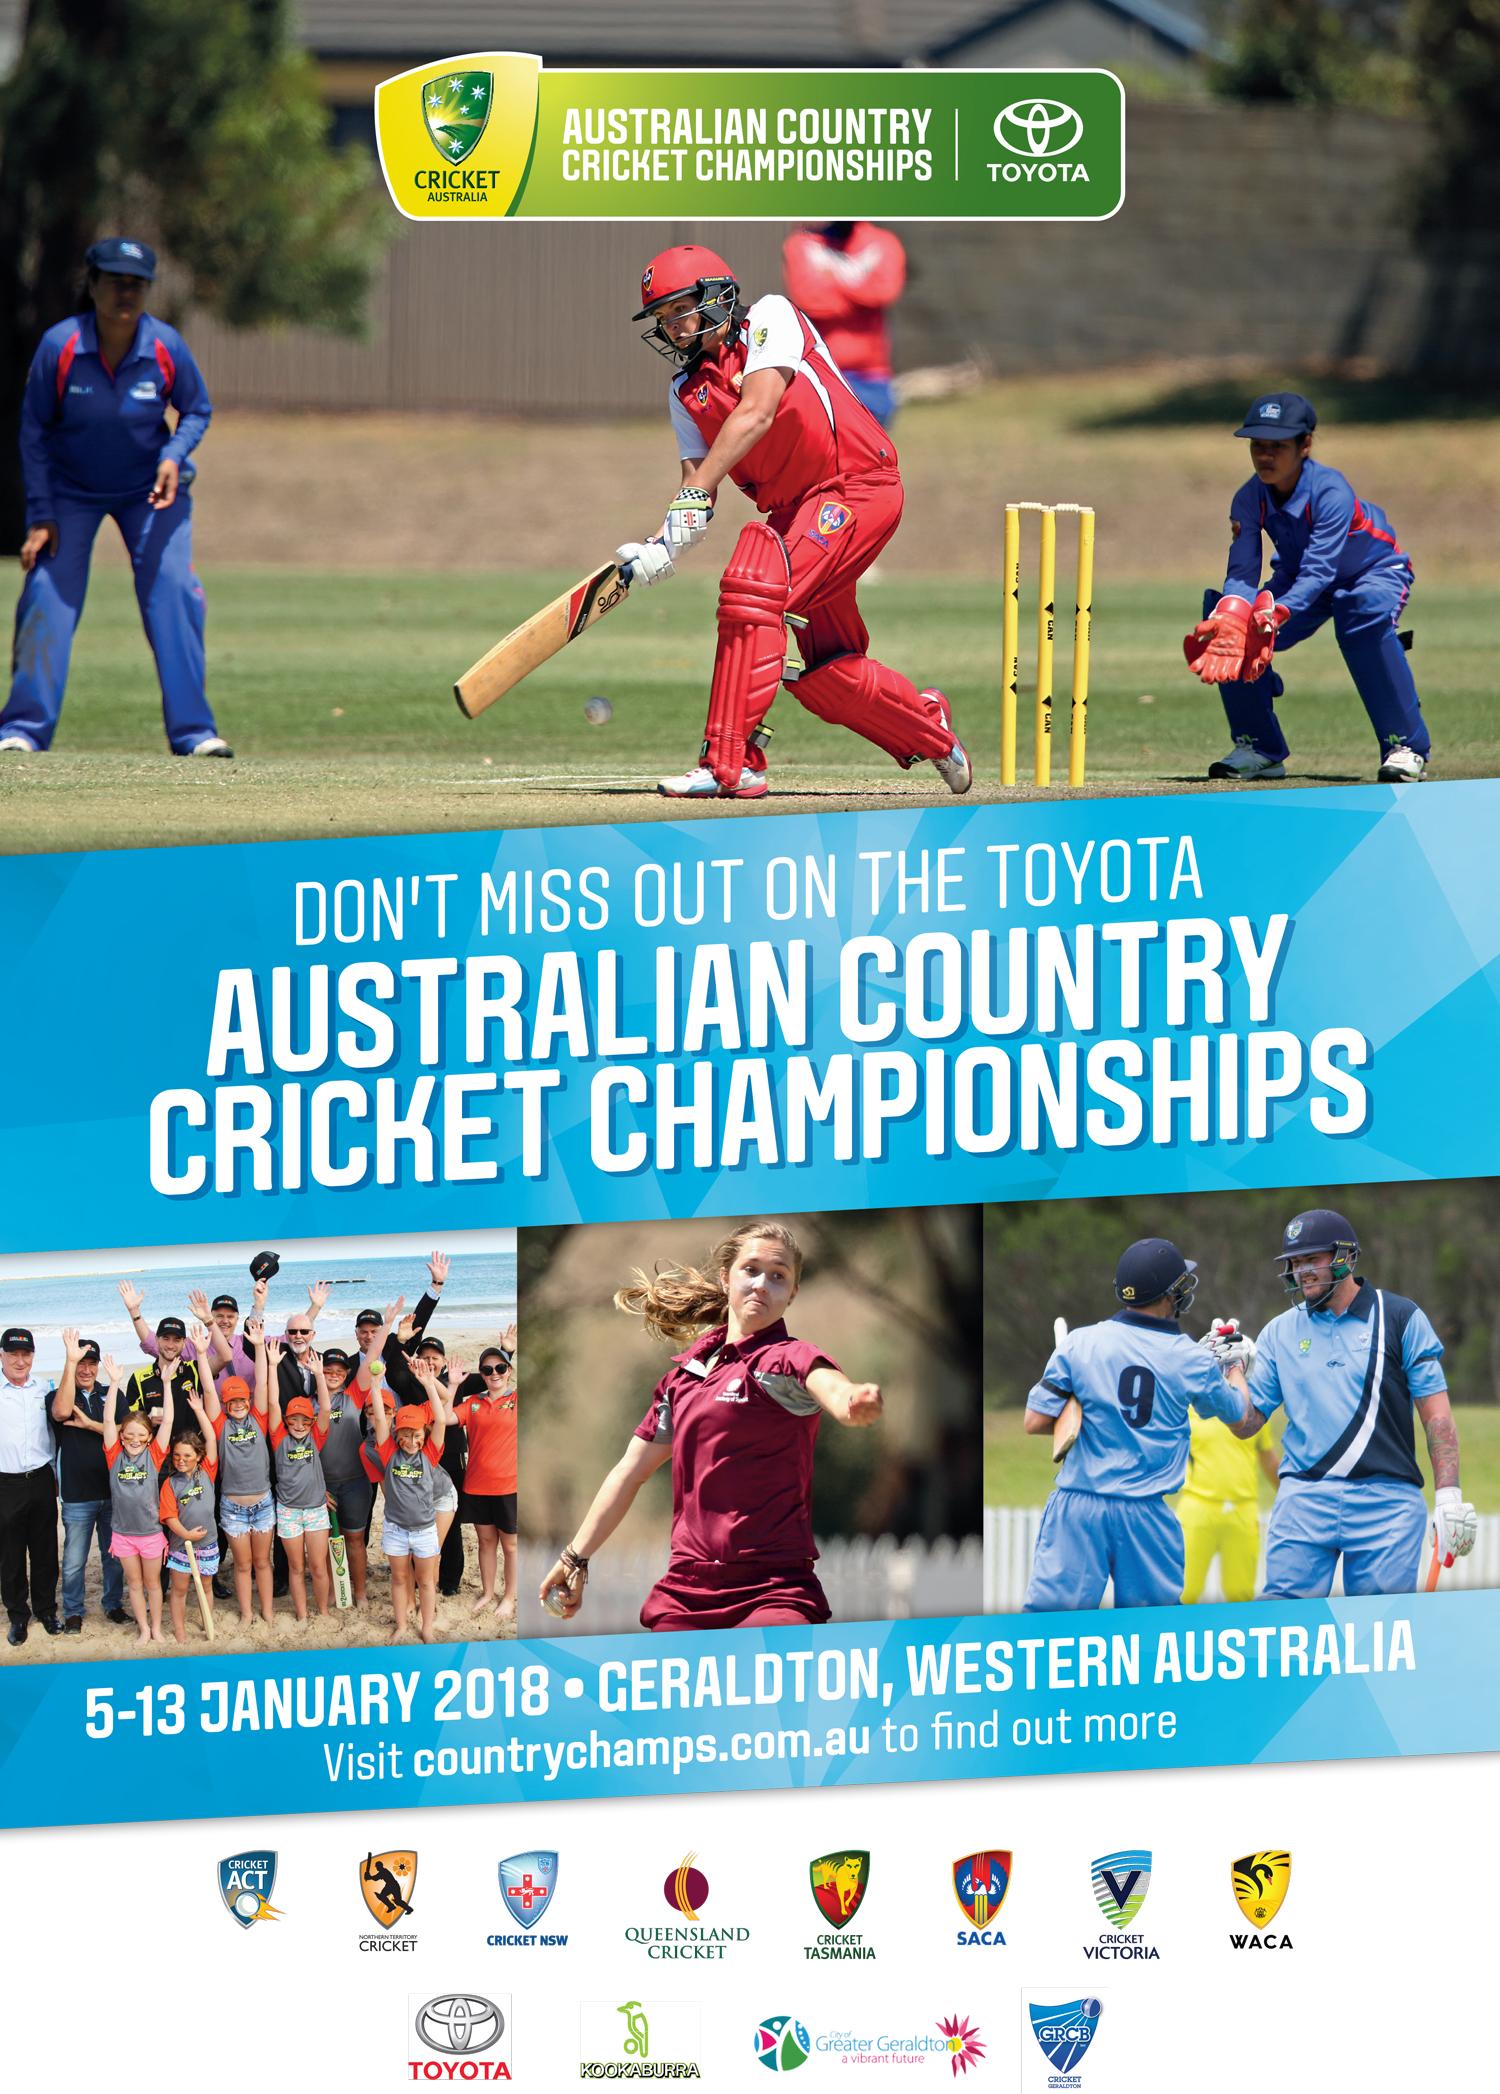 4264-Australia-Cricket-Country-Champs-Poster-2018_v02.jpg